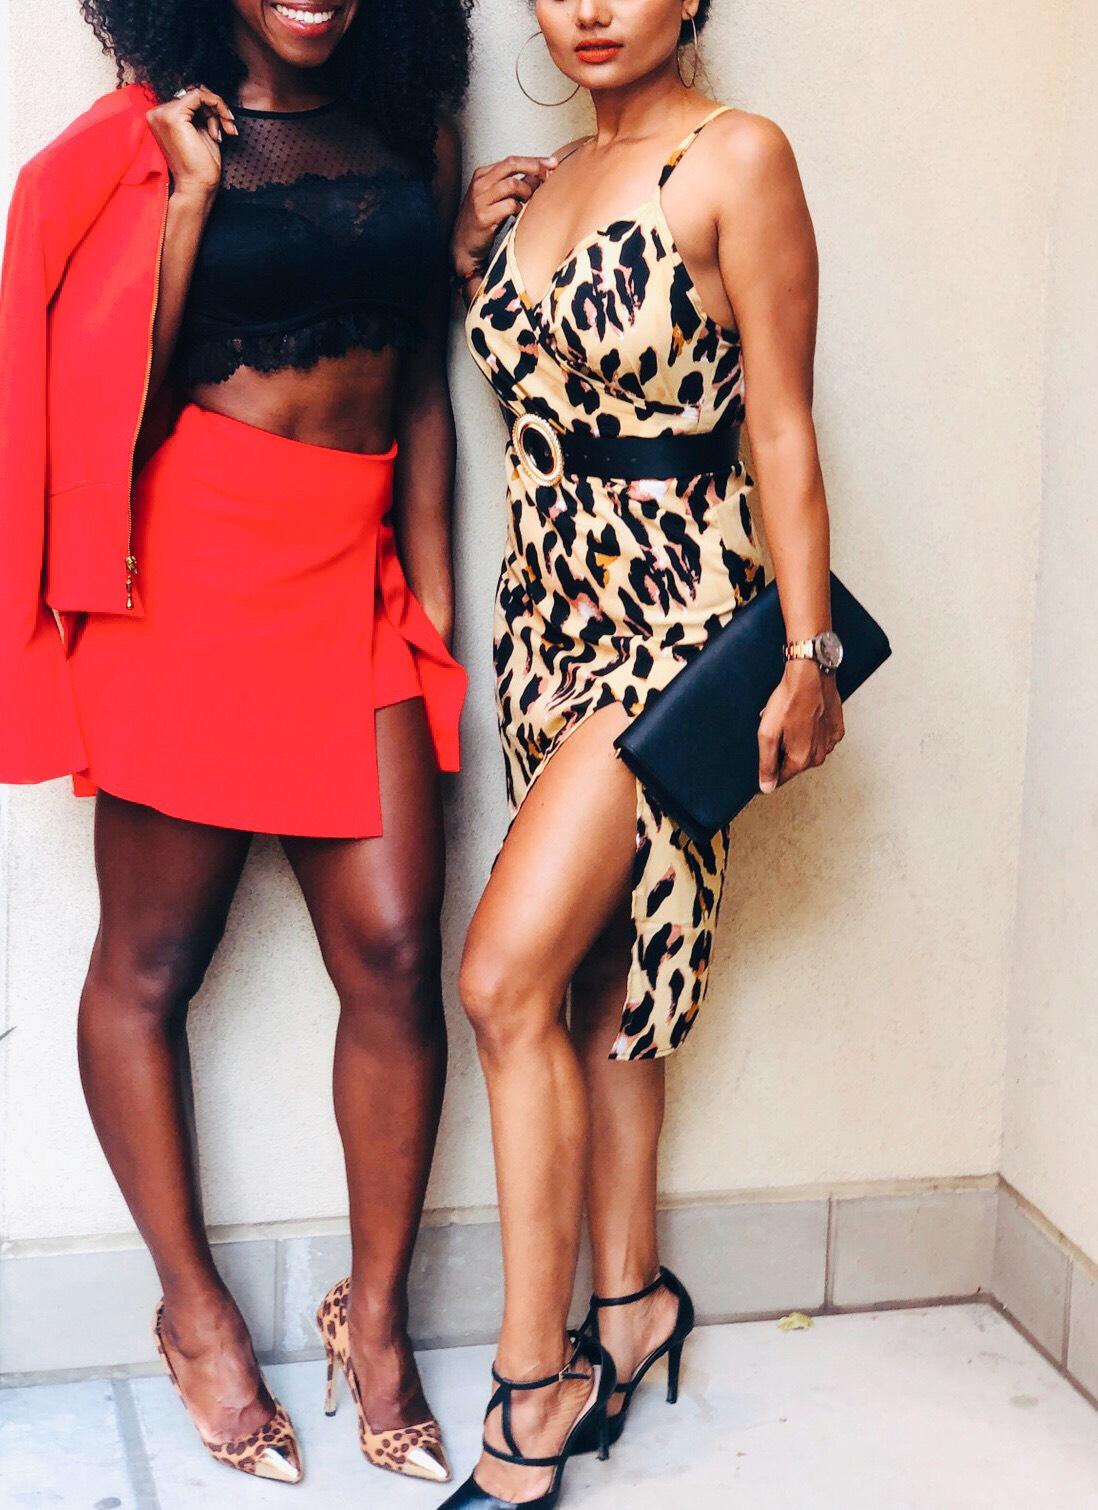 Money & Mimosas + Dress Up To Dazzle